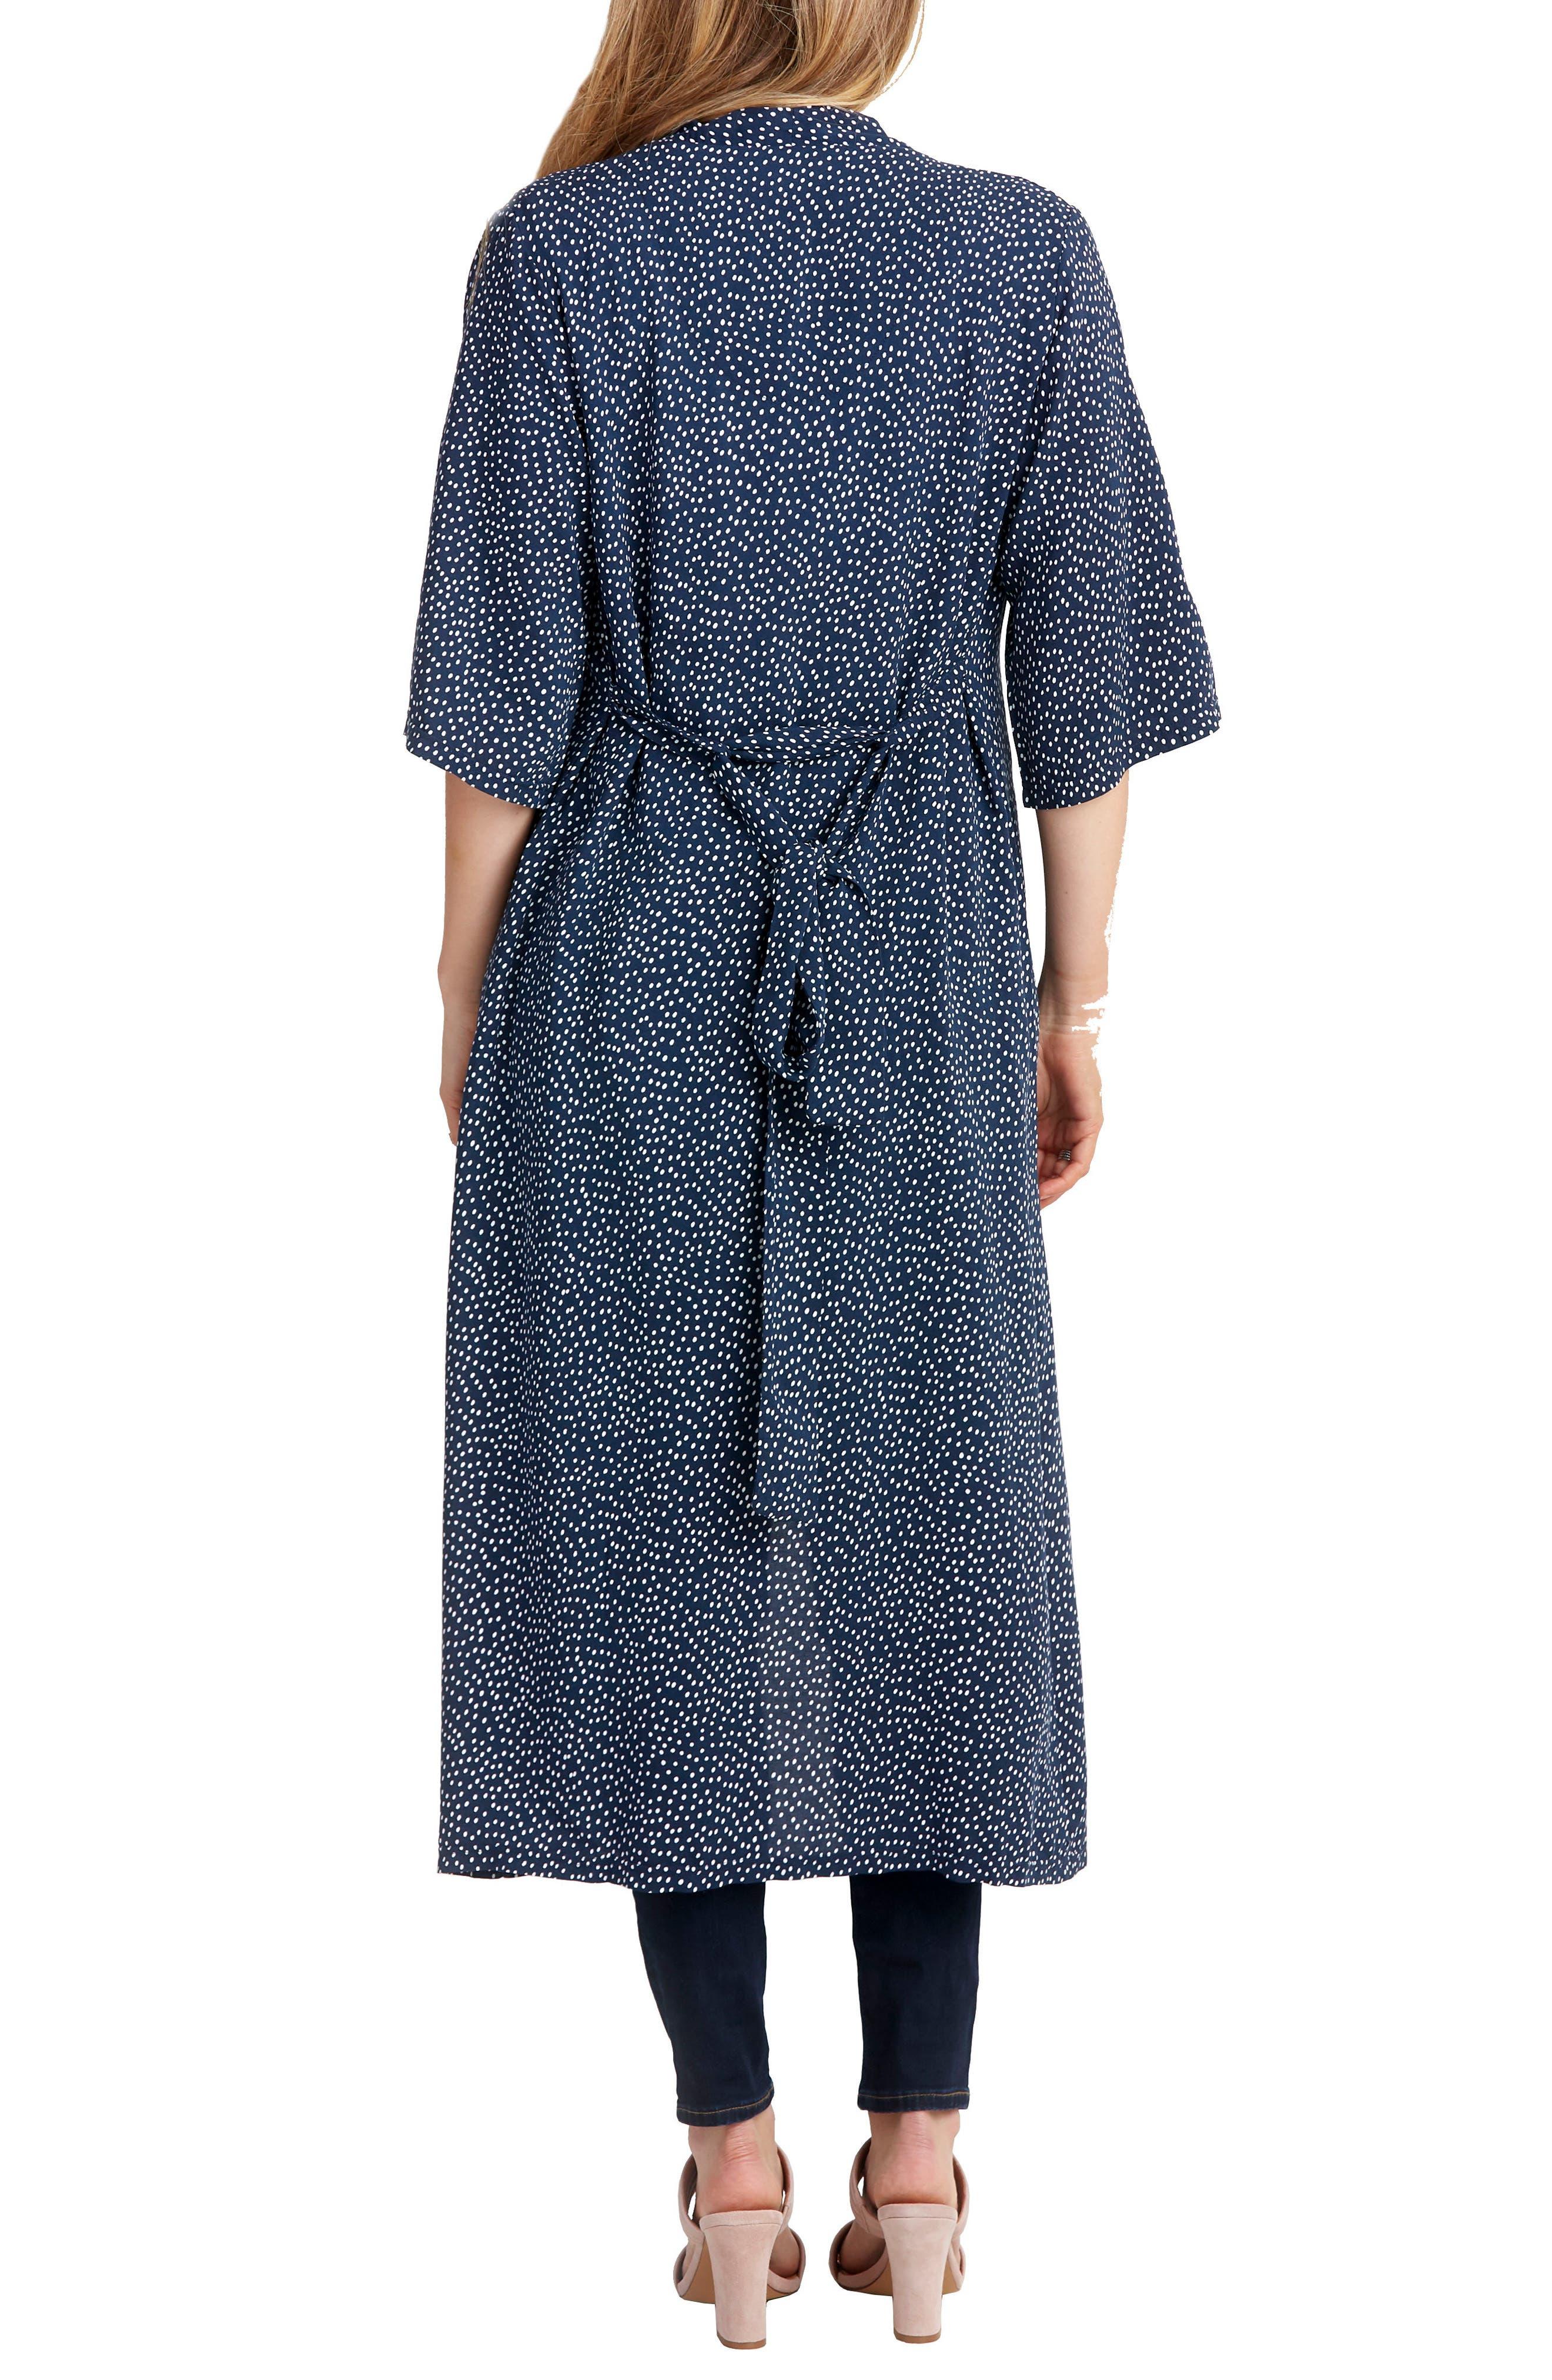 Draper Maternity Robe,                             Alternate thumbnail 2, color,                             400